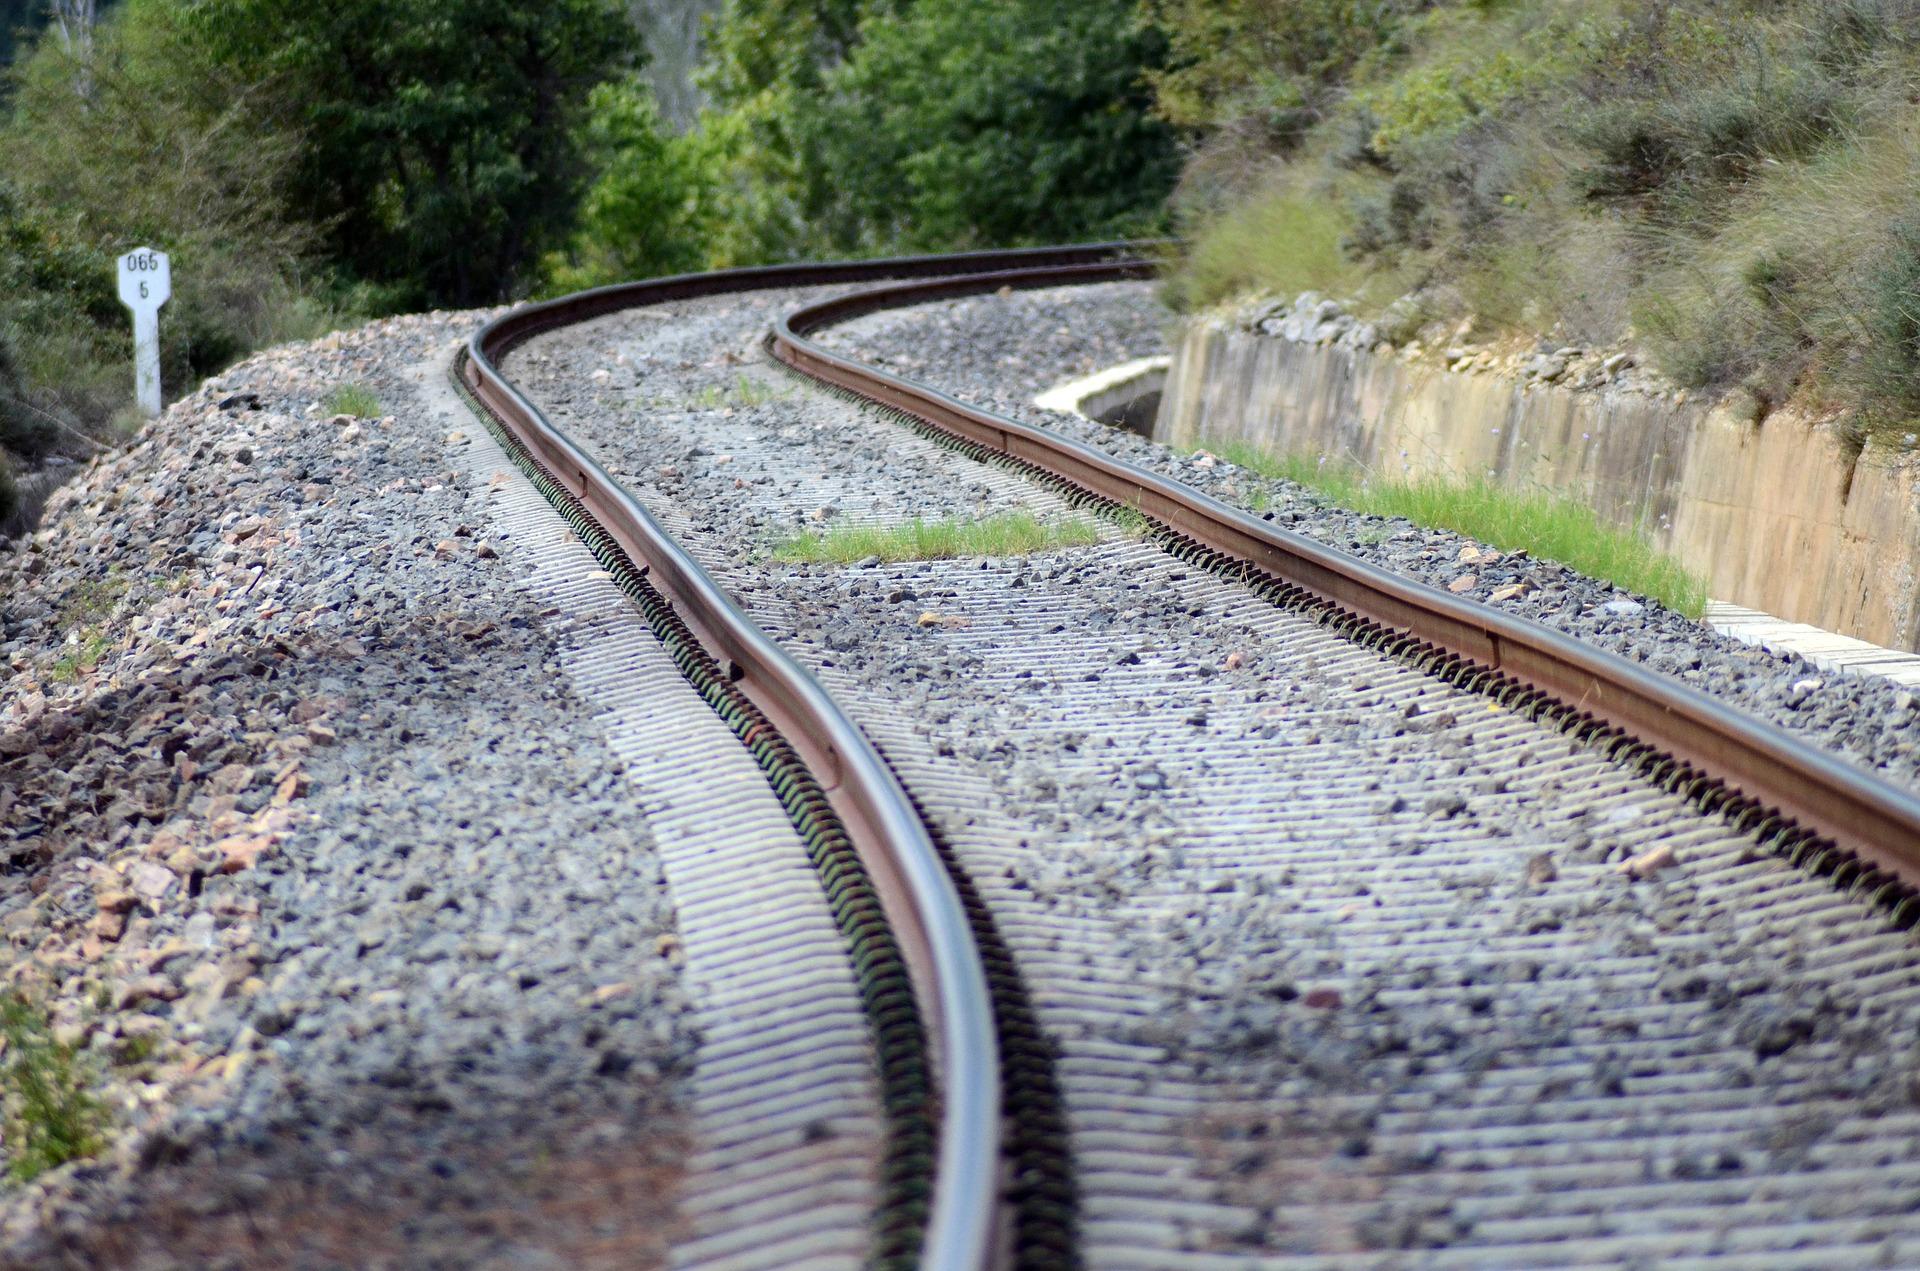 train-445392_1920.jpg